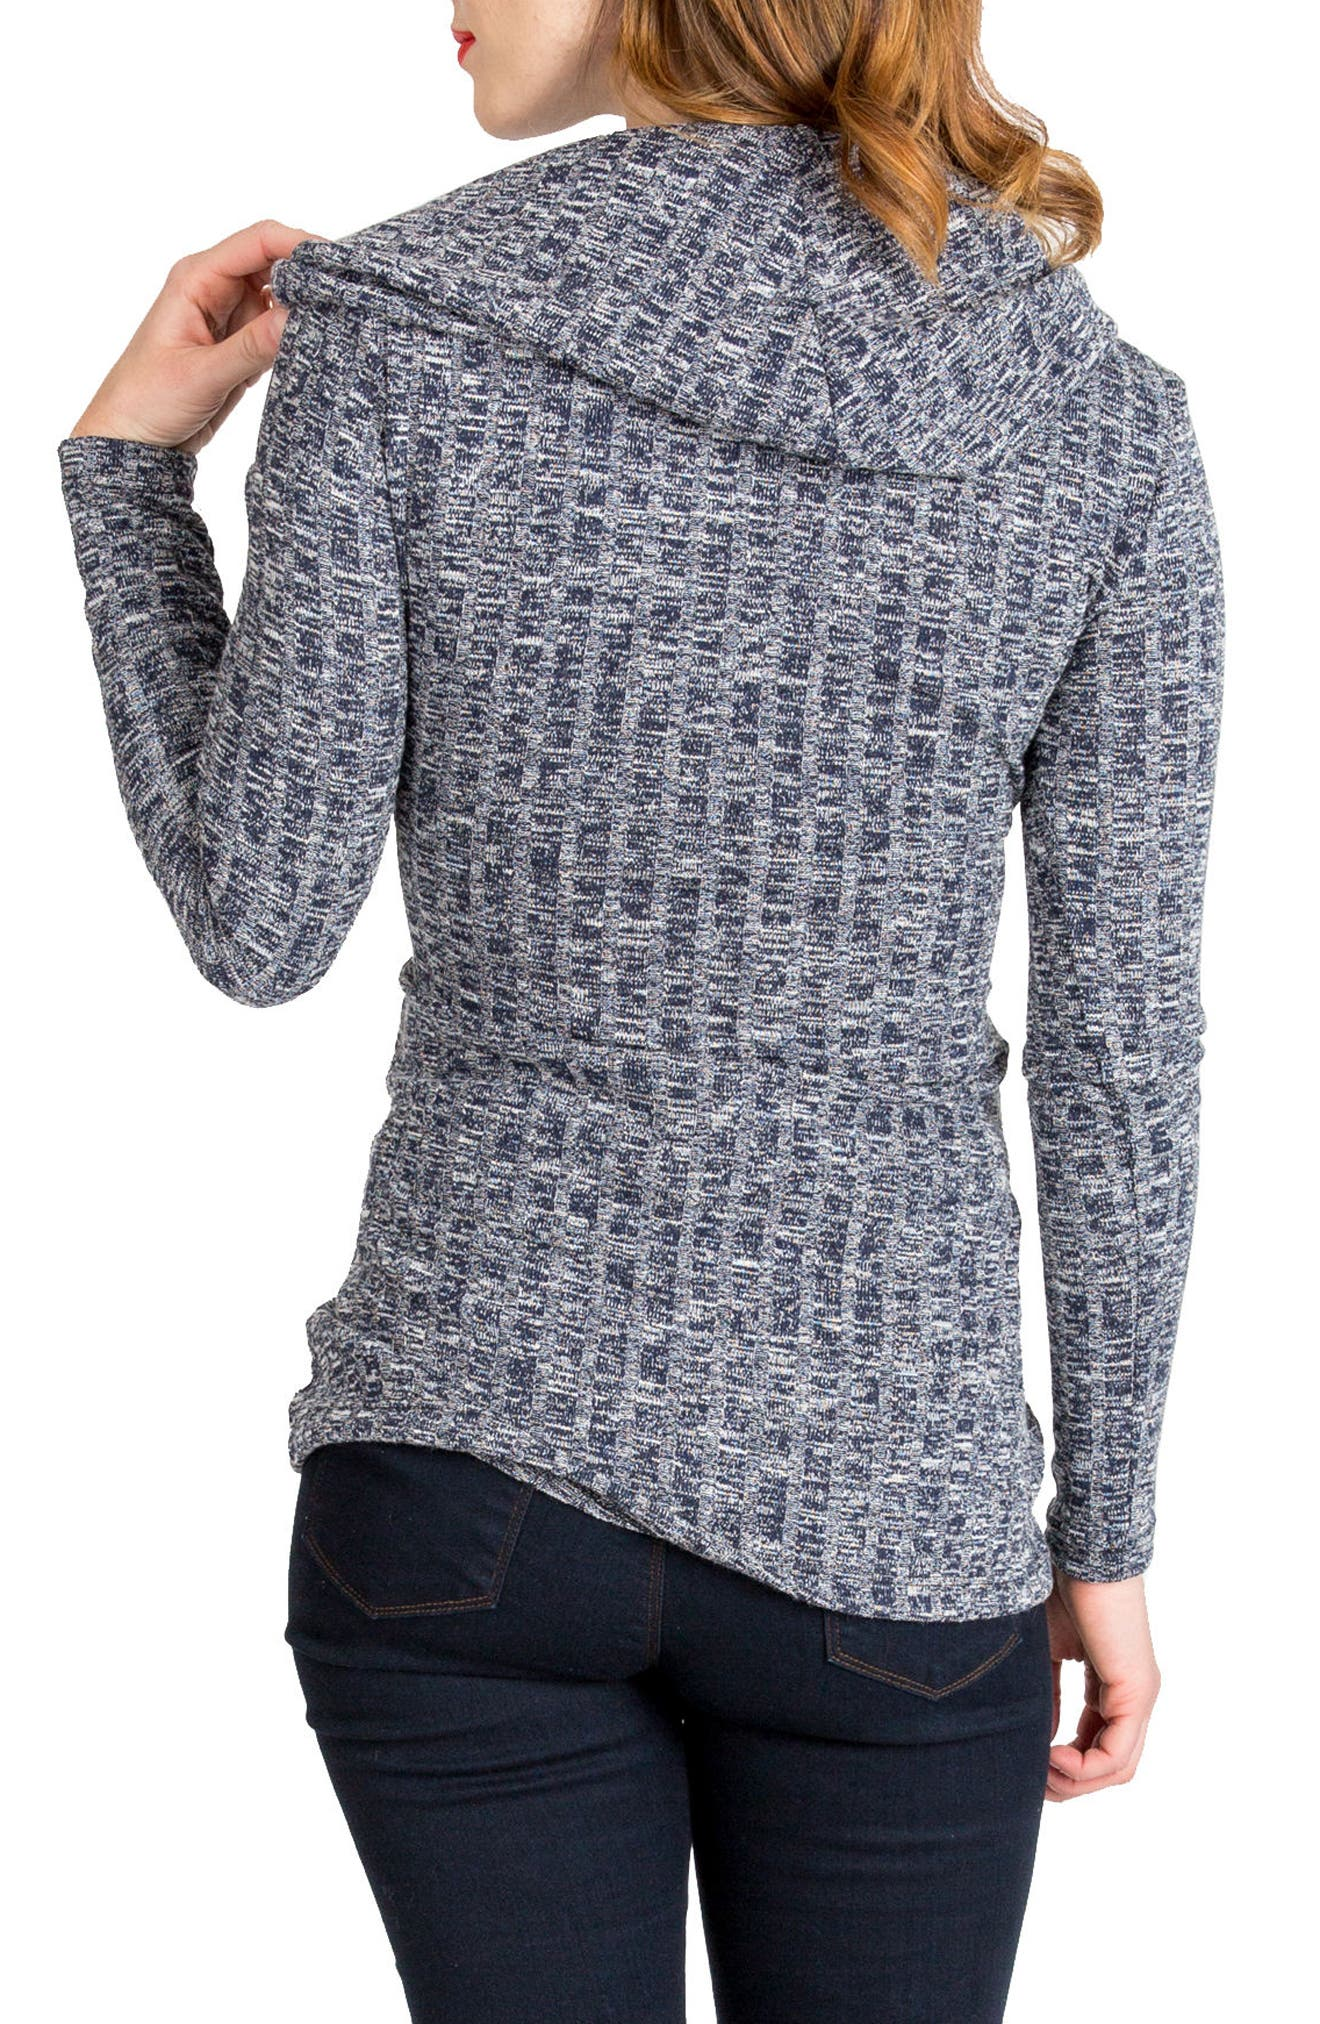 NOM MATERNITY, Ophelia Cowl Neck Maternity Sweater, Alternate thumbnail 2, color, NAVY HEATHER RIB